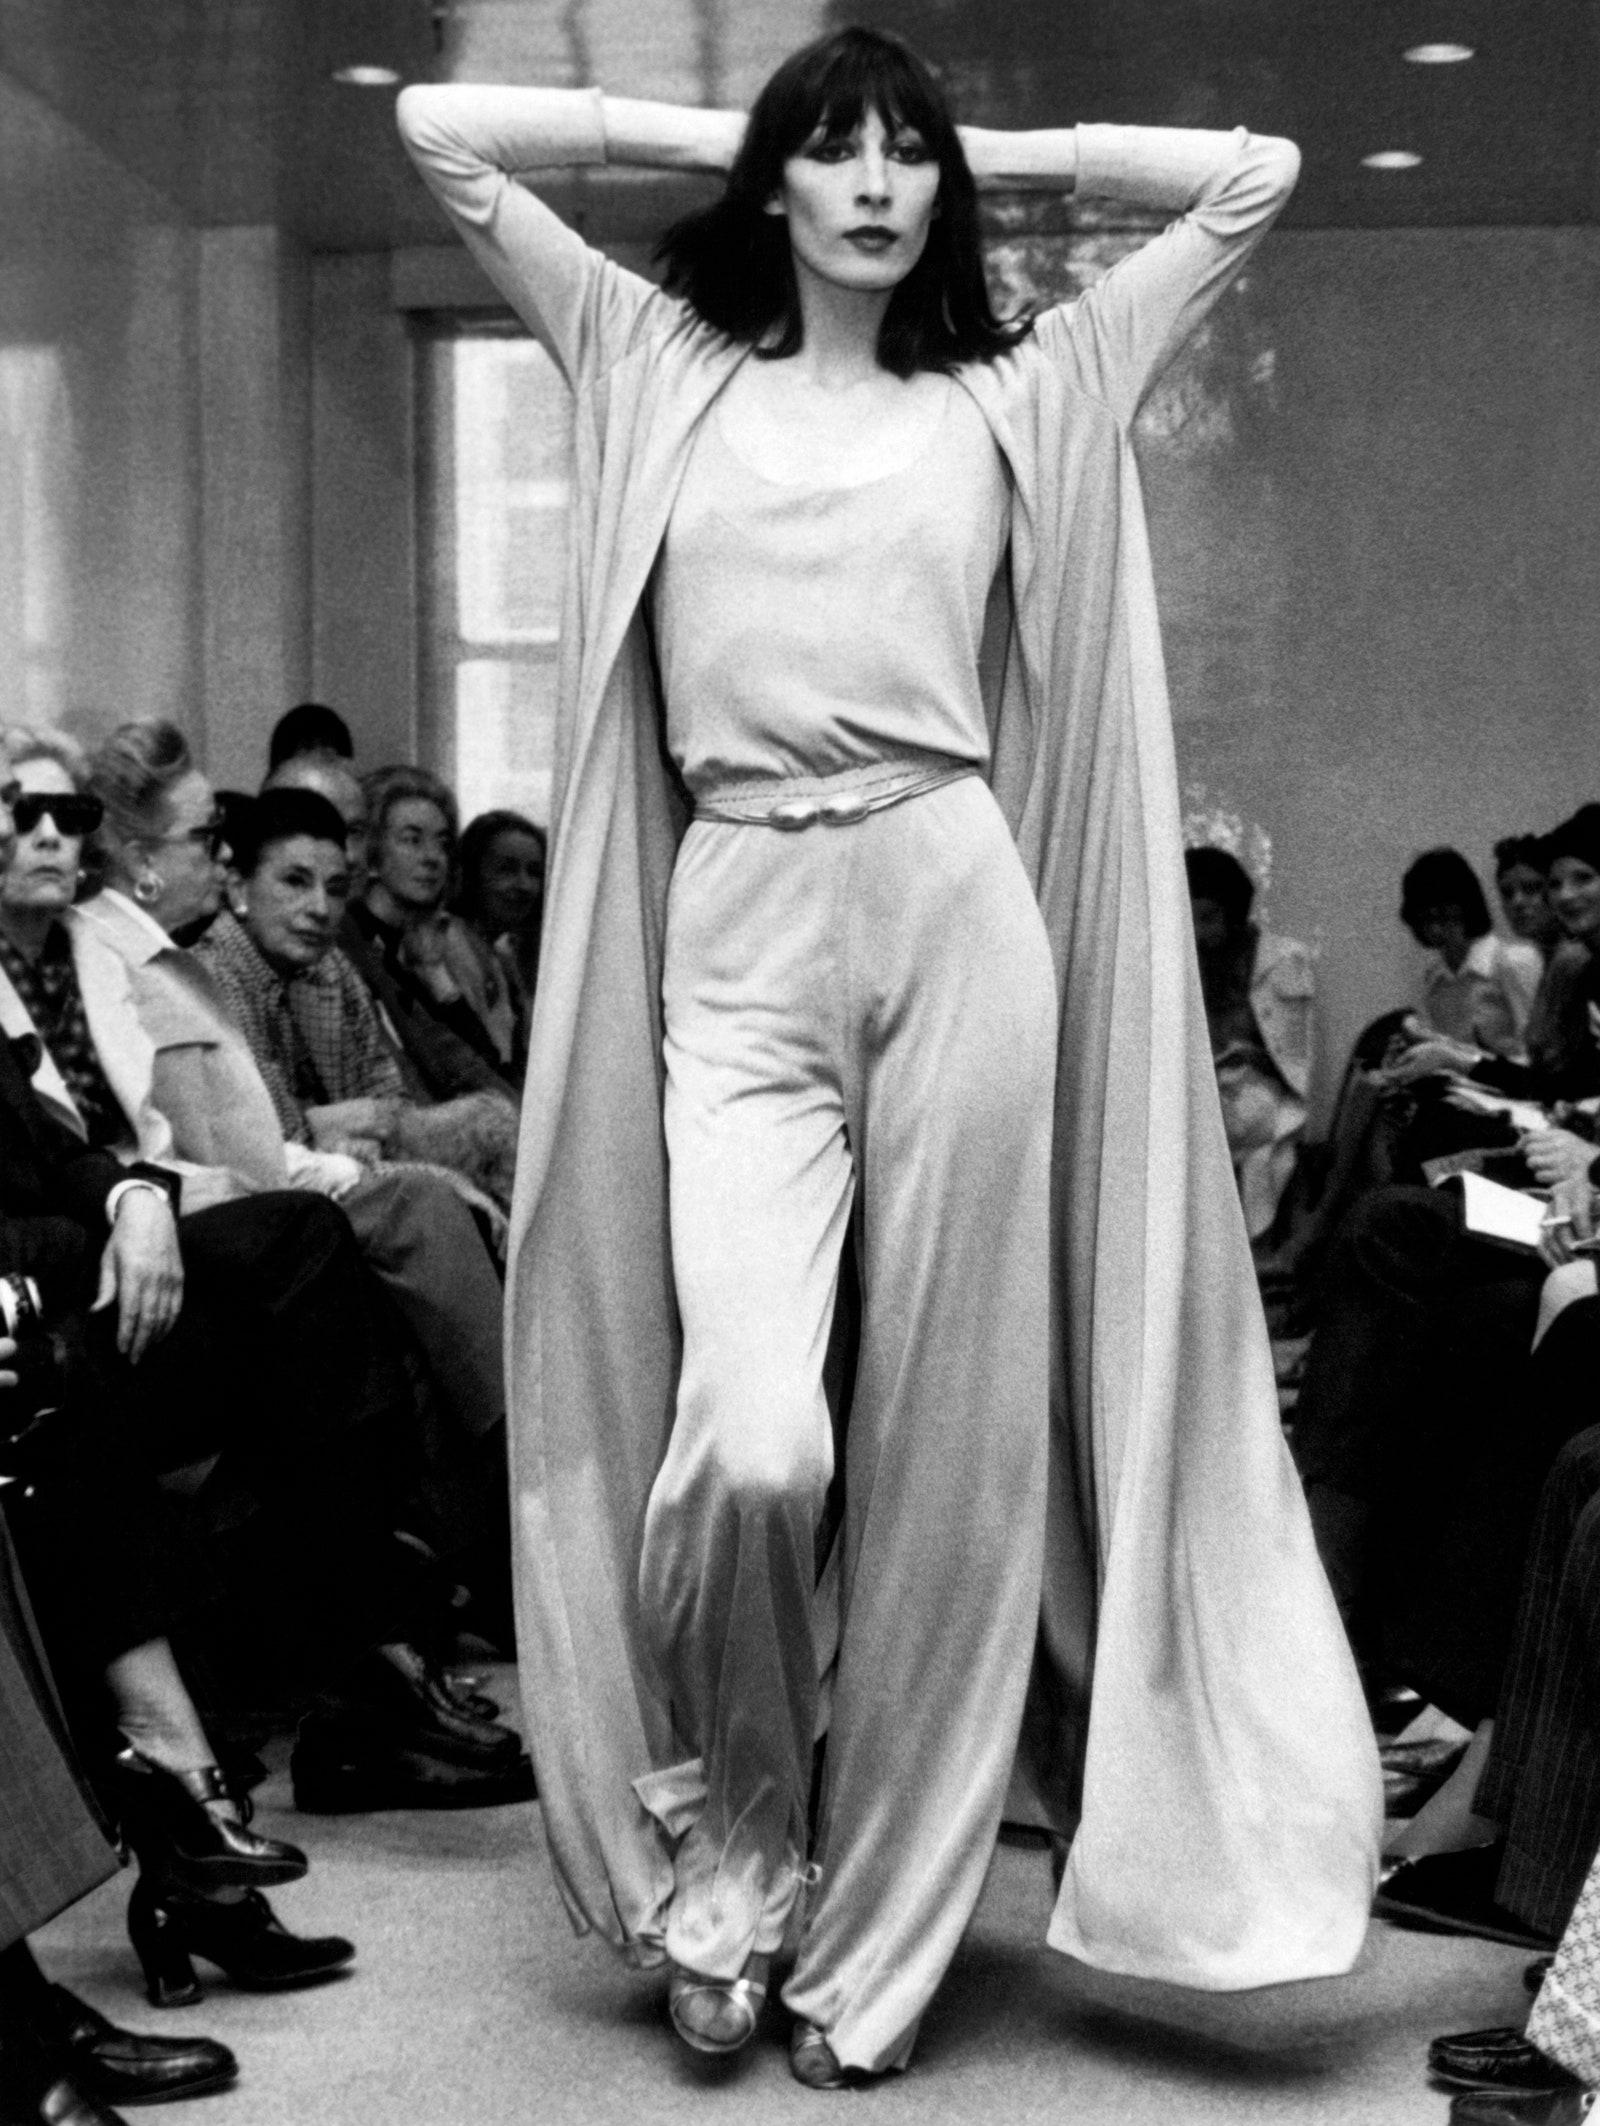 Angelica Huston catwalk cho Halston, New York, 23/5/1972